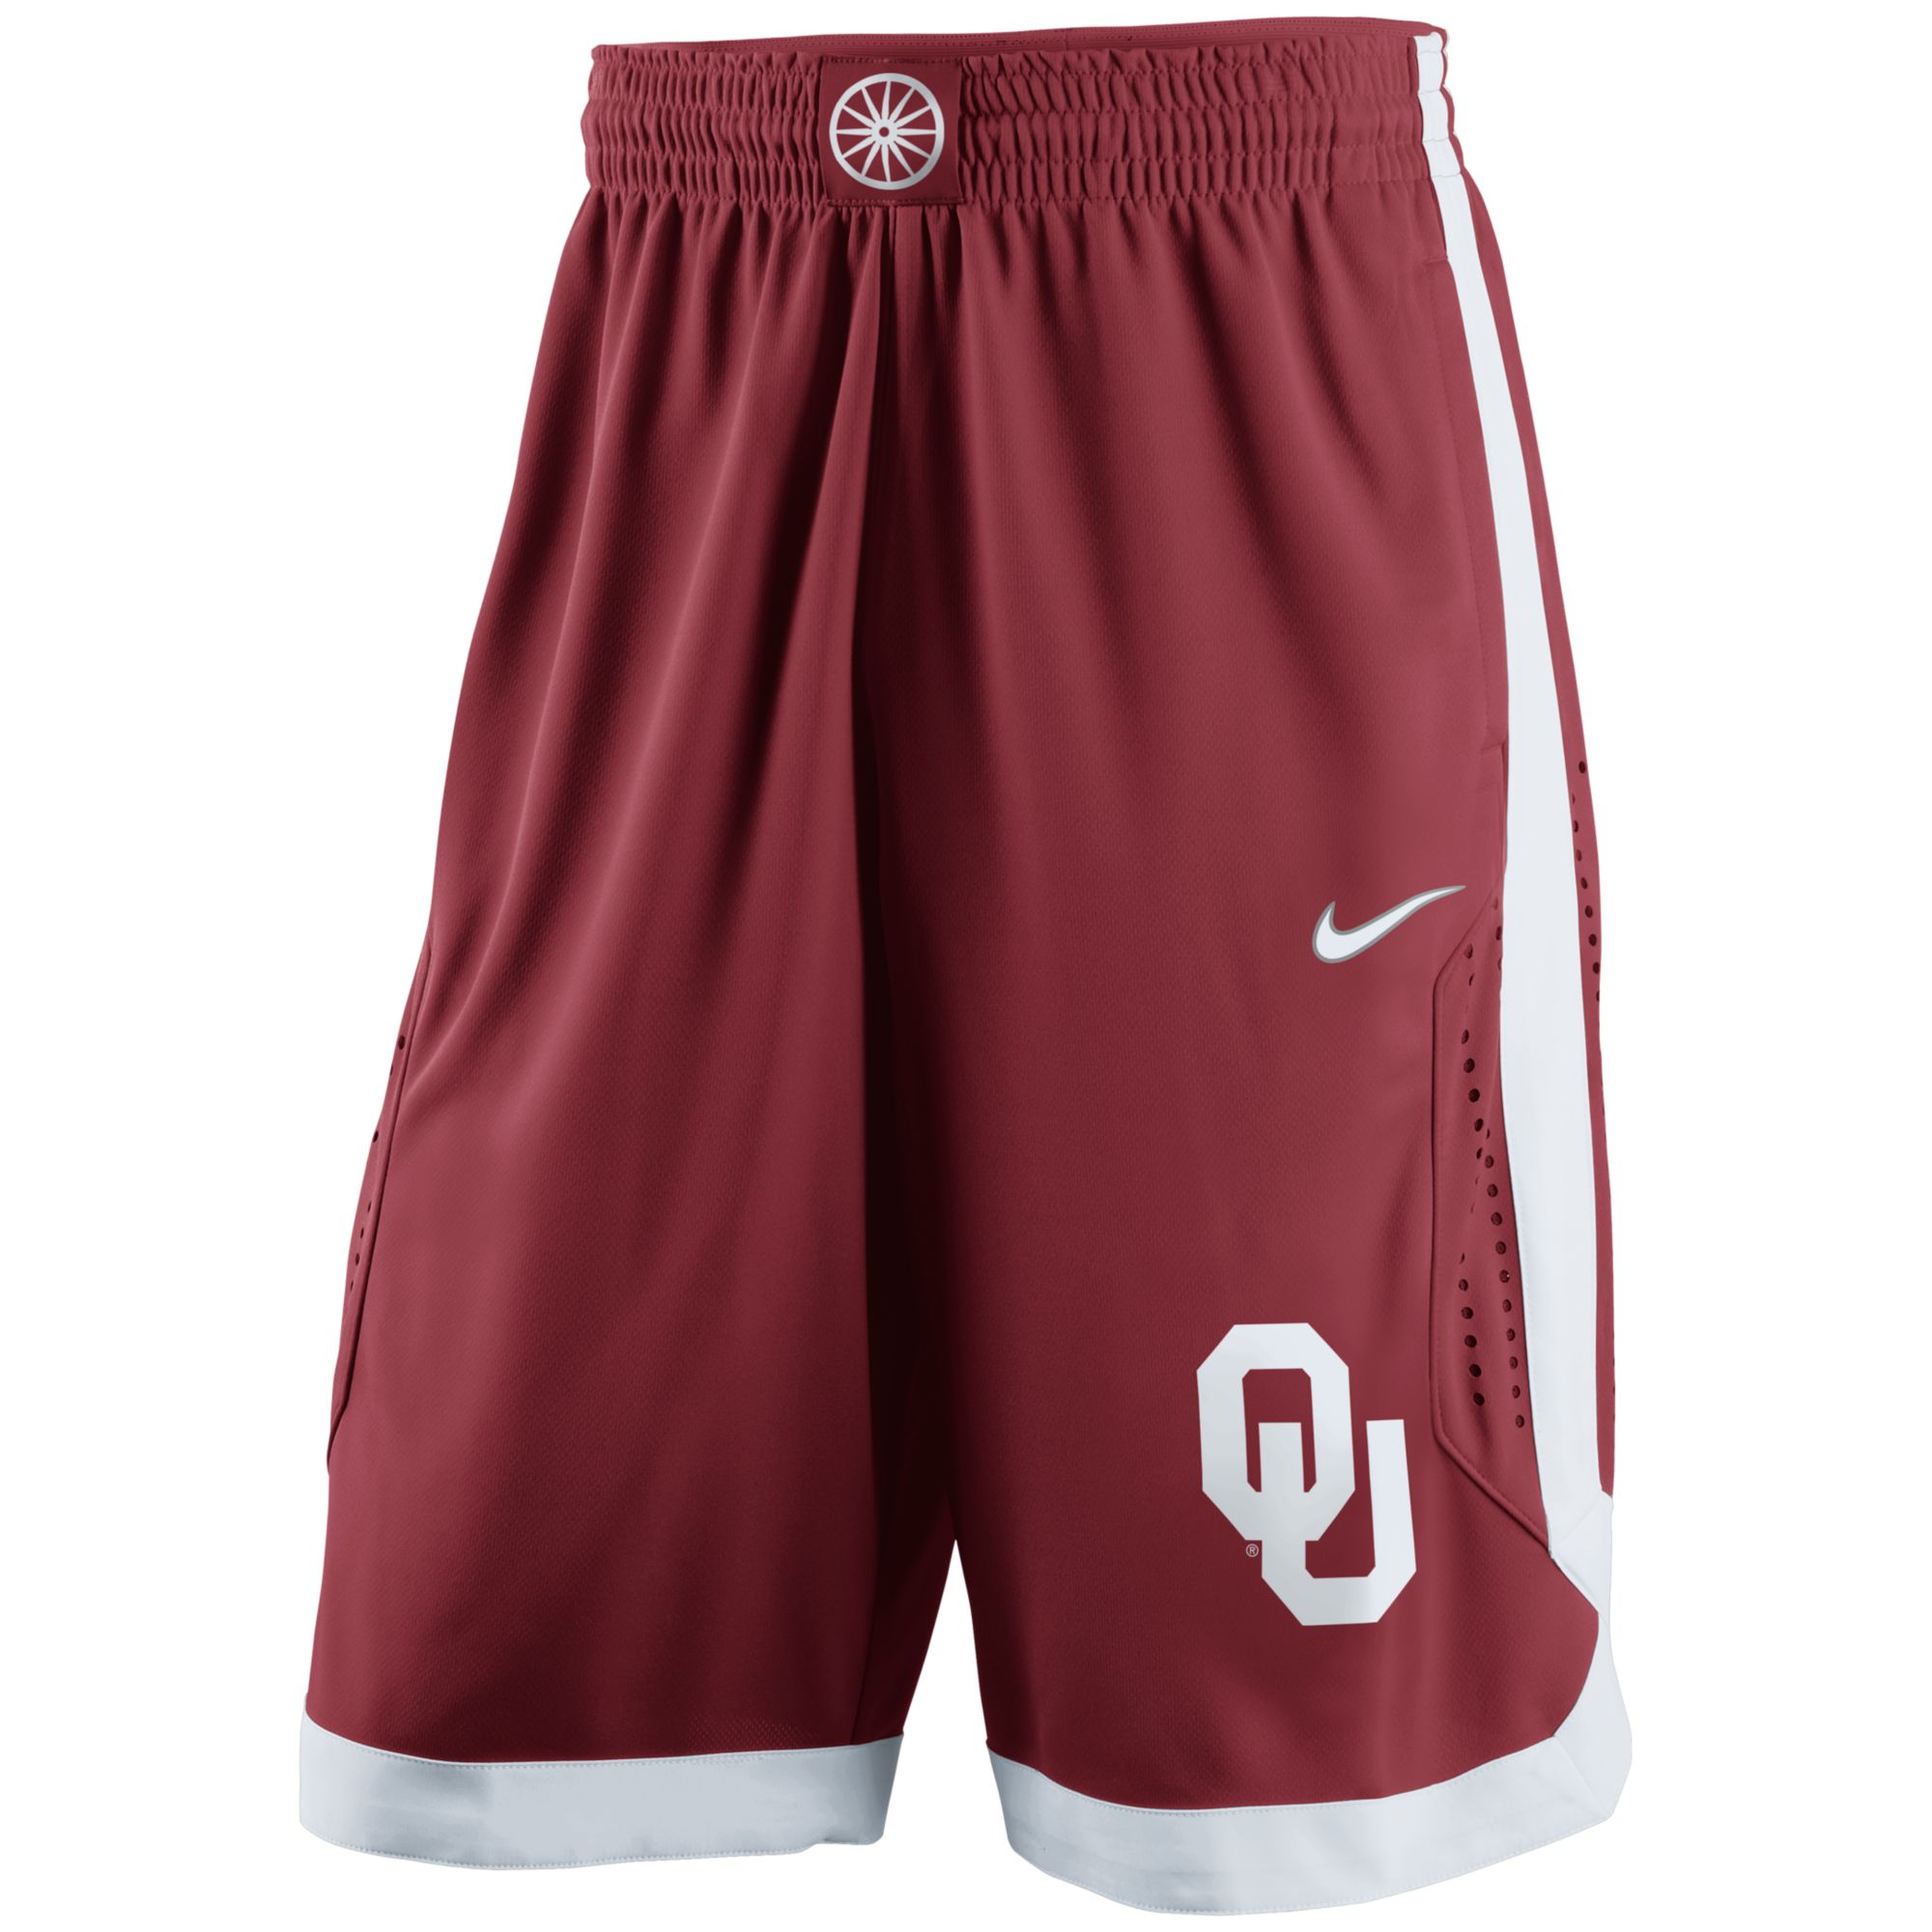 Lyst - Nike Mens Oklahoma Sooners Replica Basketball ...